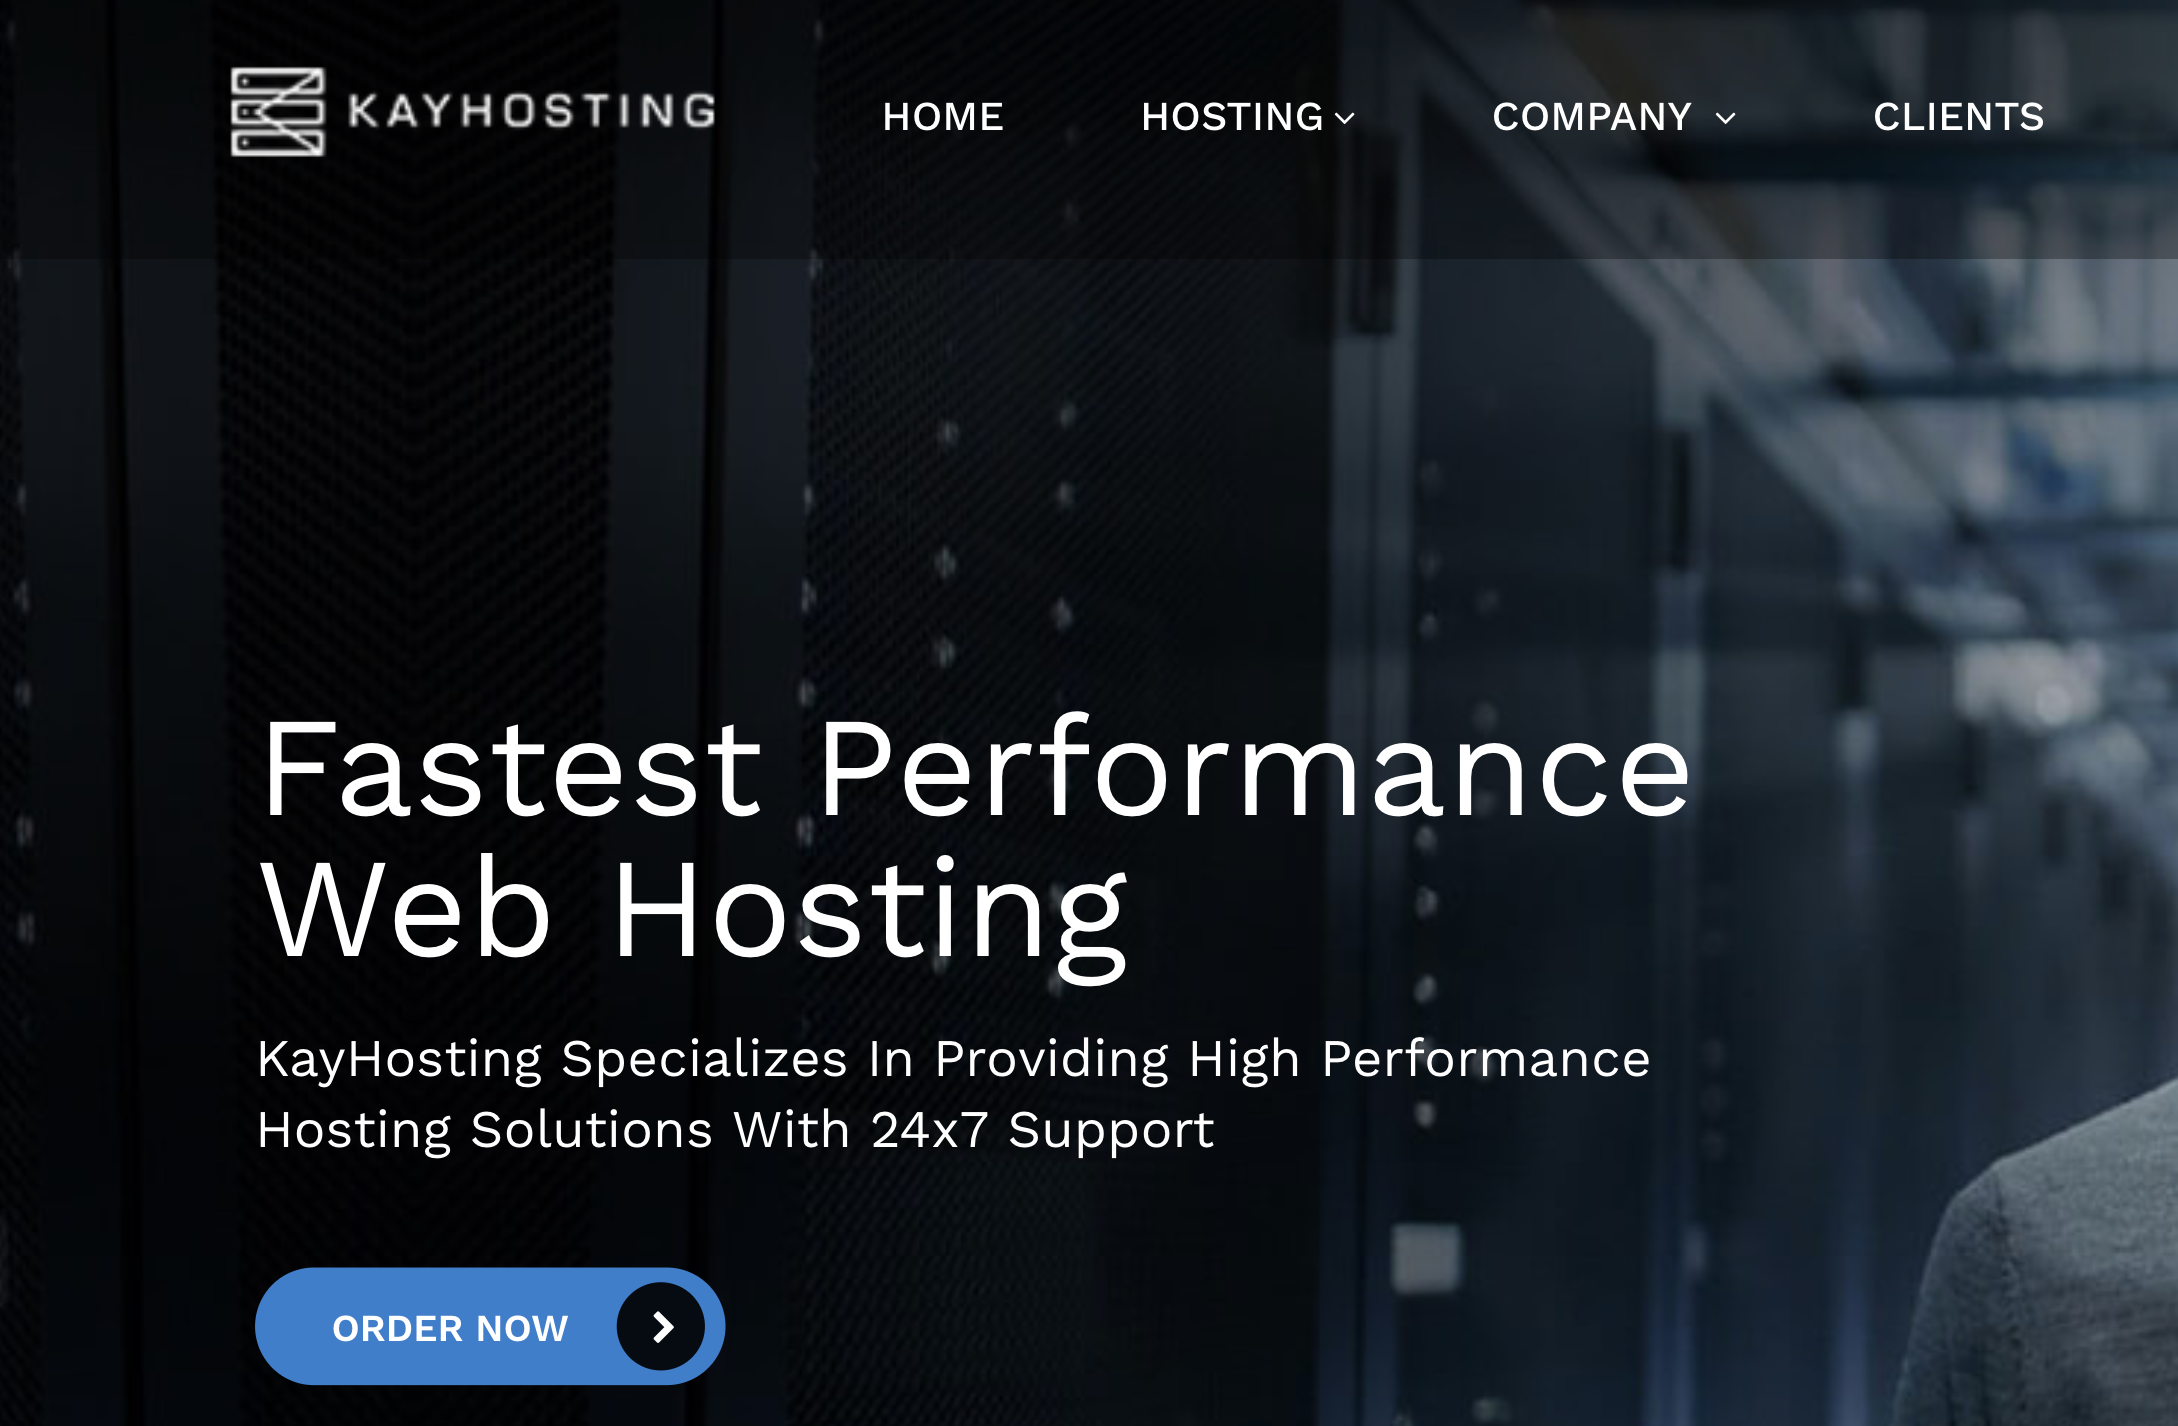 KayHosting年付11美元OpenVZ VPS,KayHosting年付19美元KVM VPS 支持免费Windows系统,KayHosting优惠码。芝加哥VPS